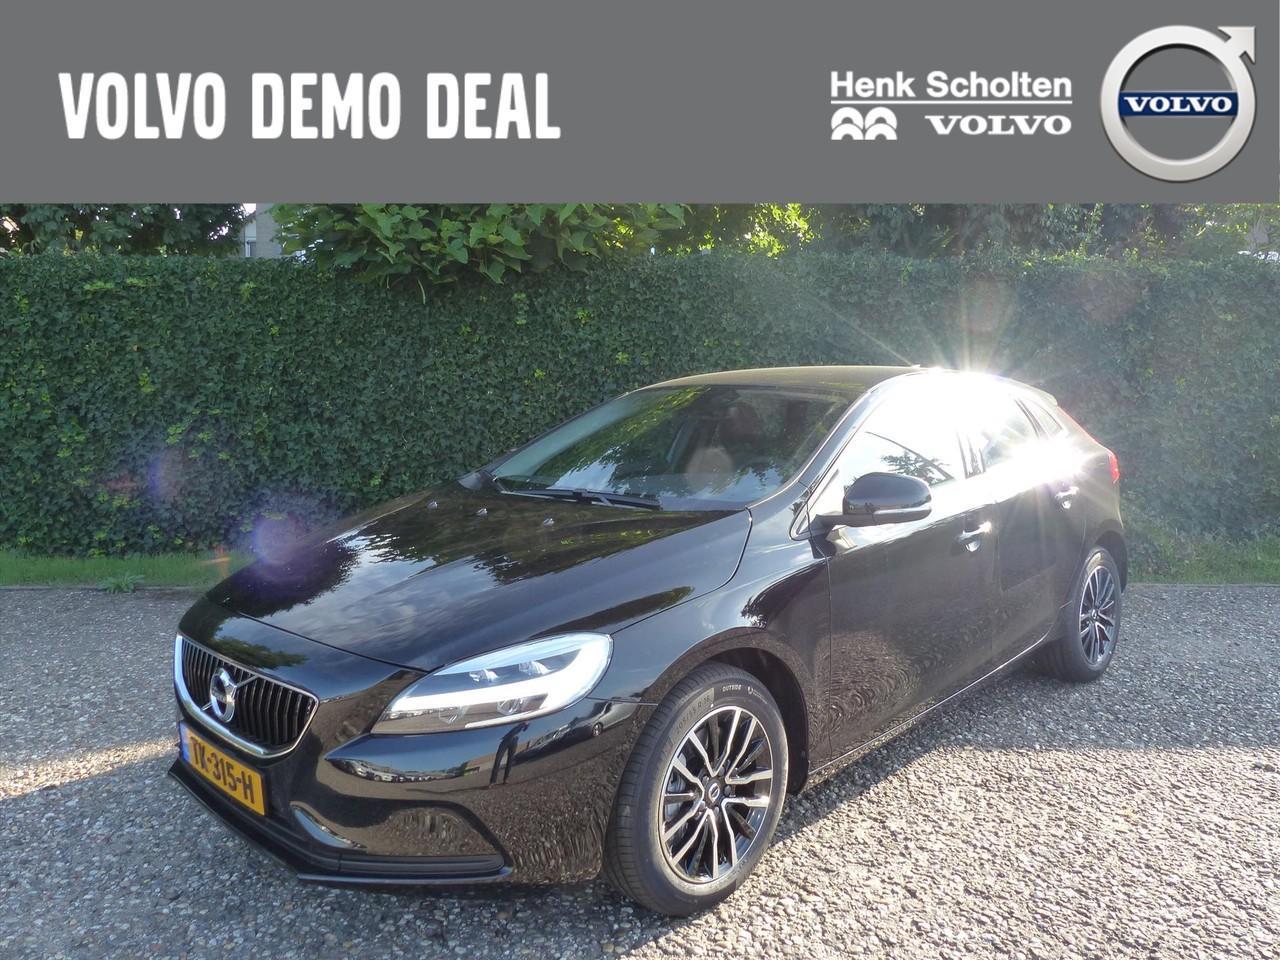 Volvo V40 2.0 d2 120pk gt edition+ navi, led koplampen, volvo on call